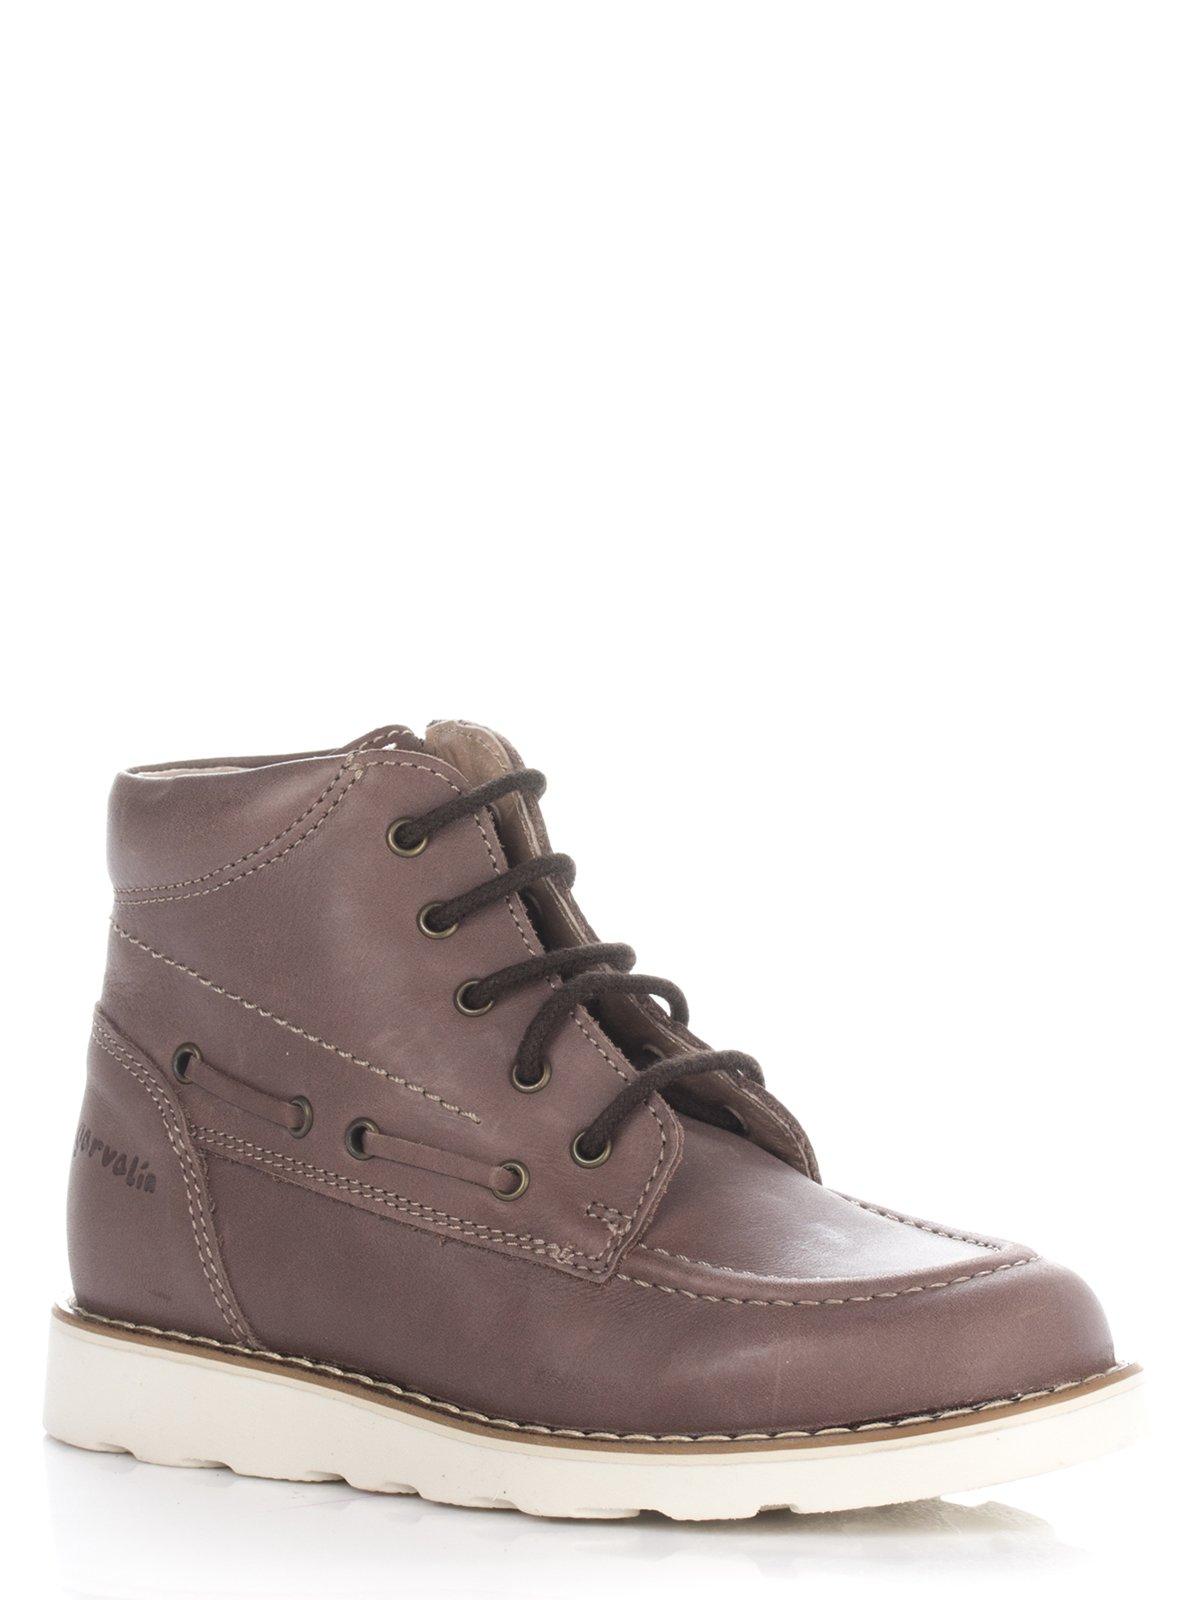 Ботинки коричневые | 677923